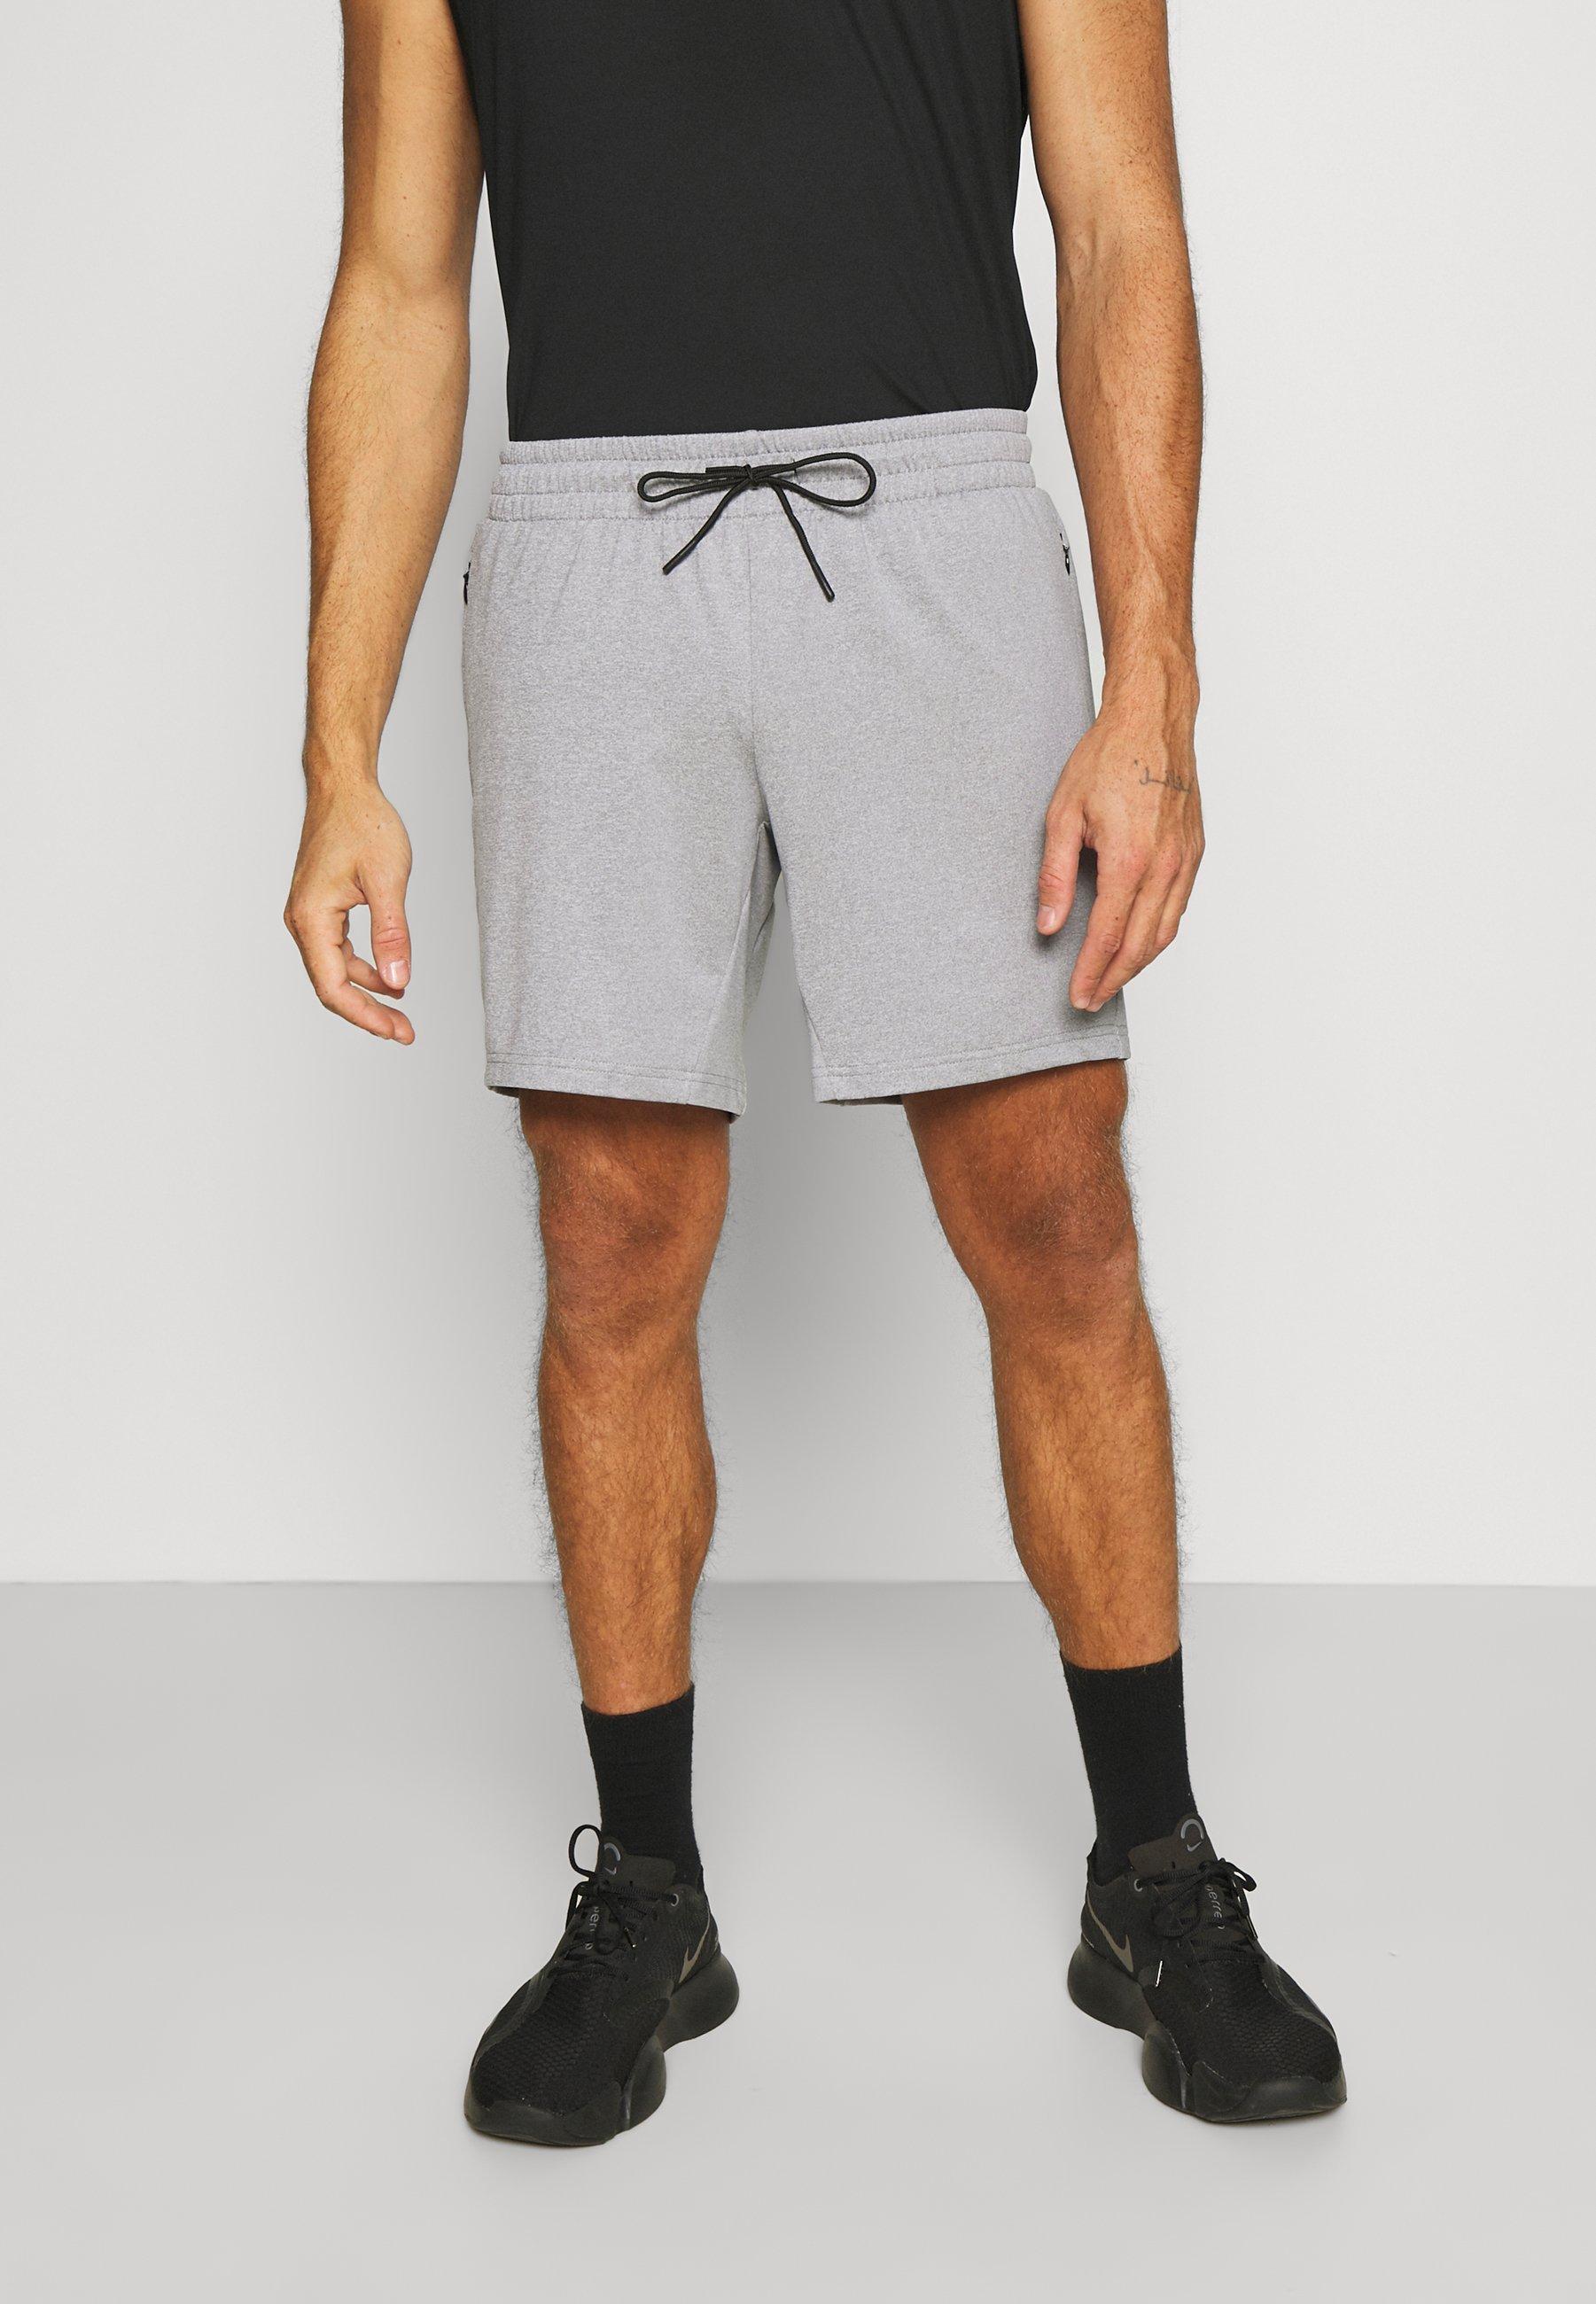 Men Men's training shorts - Sports shorts